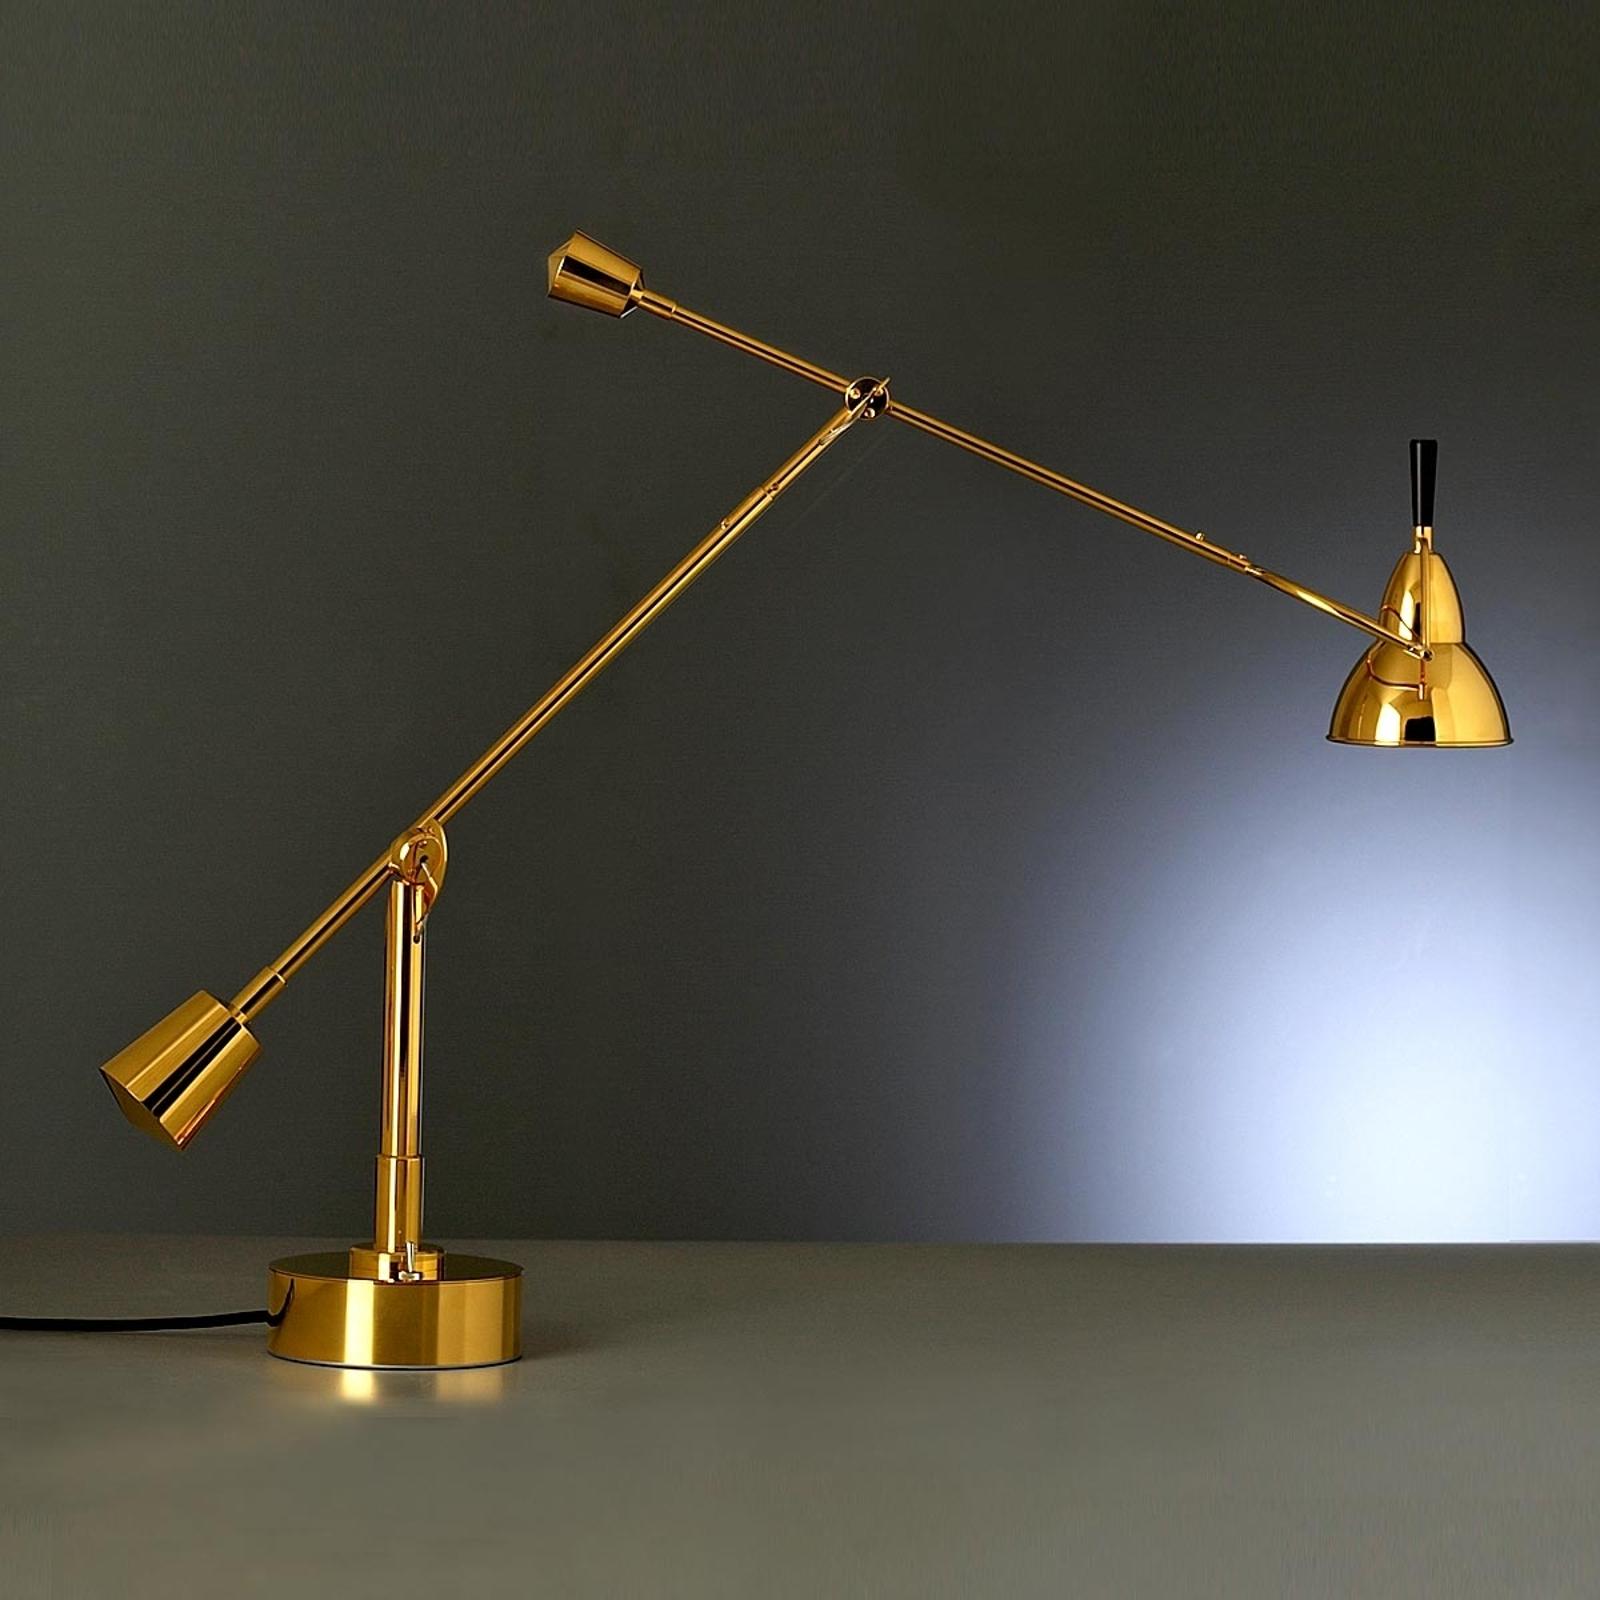 TECNOLUMEN Buquet tafellamp 24 karaats verguld